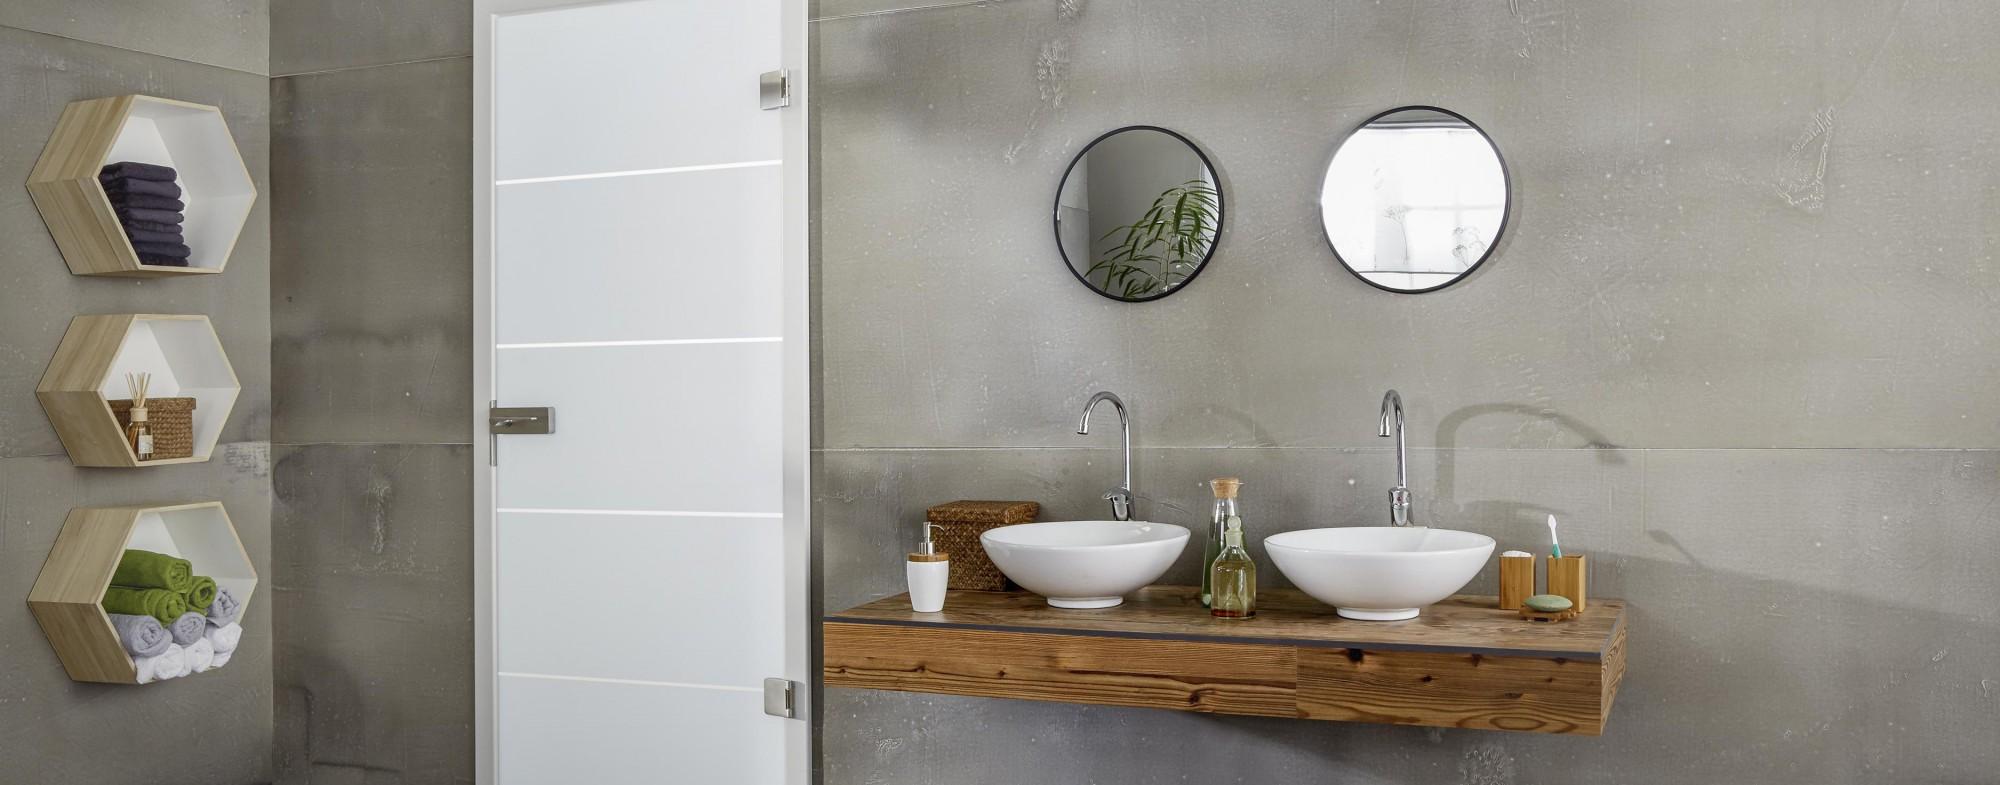 Badezimmer Betonoptik